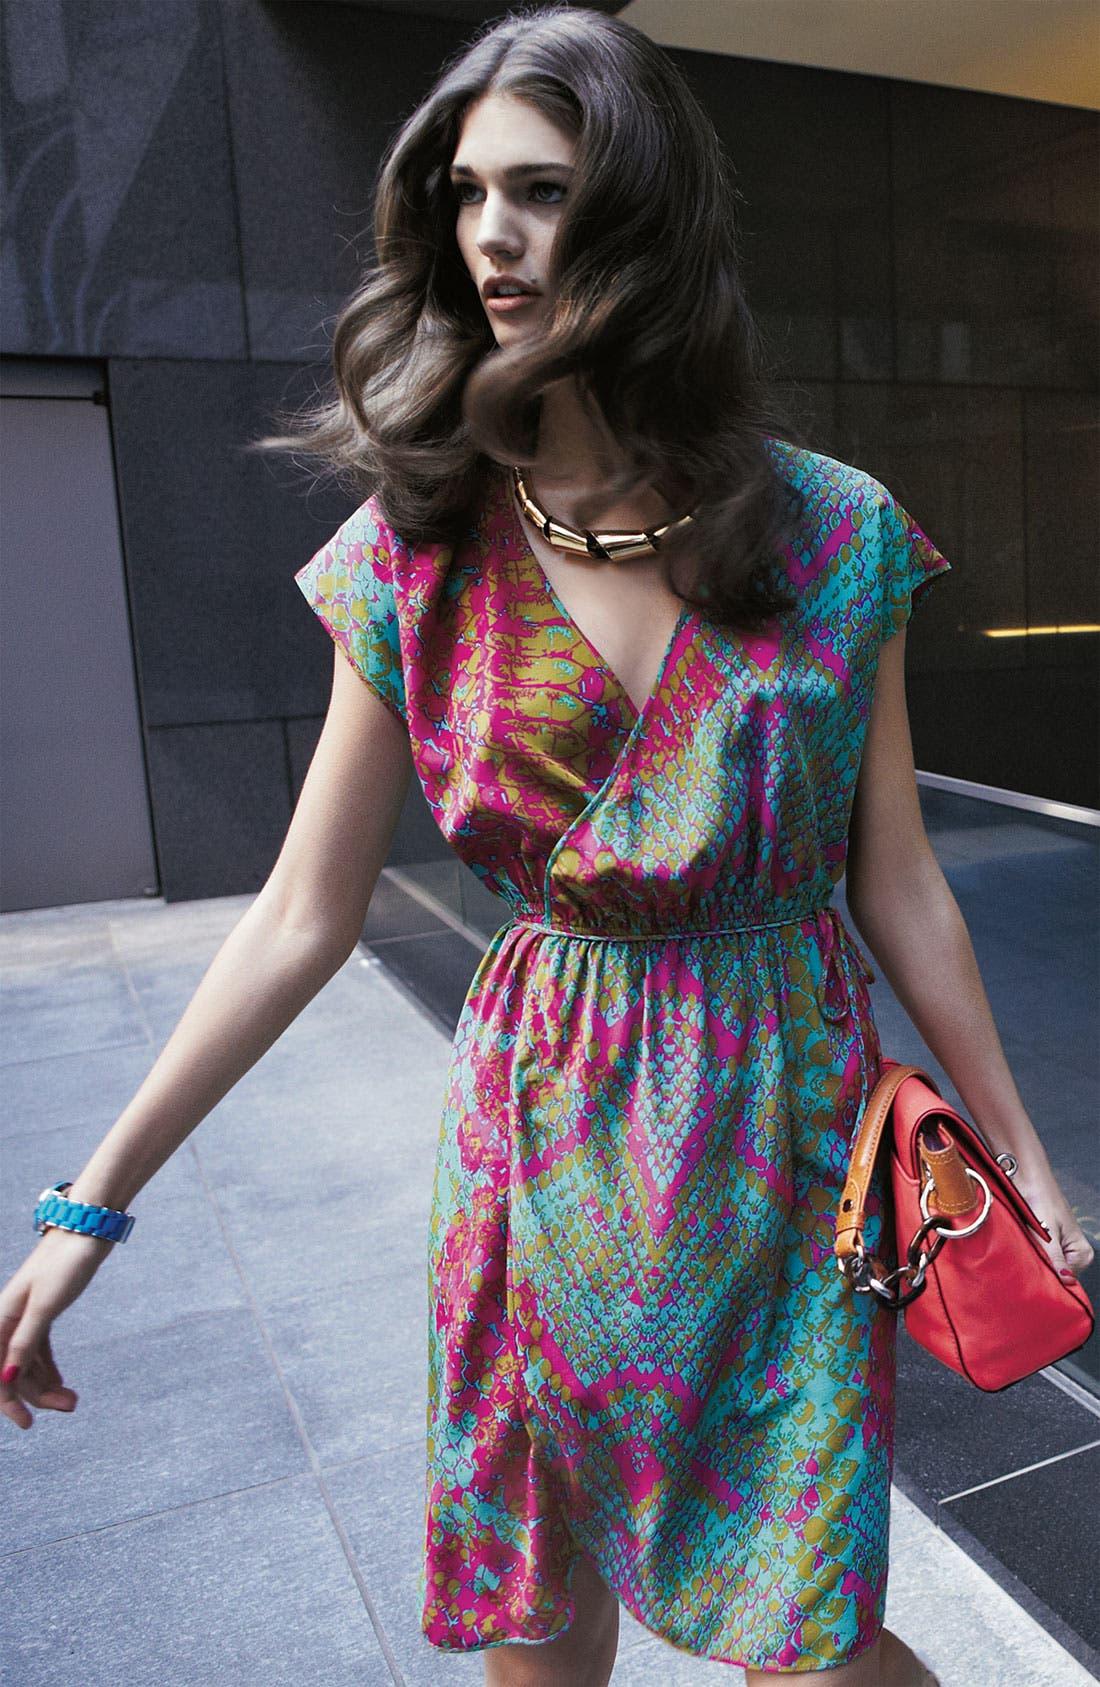 Main Image - Presley Skye Dress & Accessories